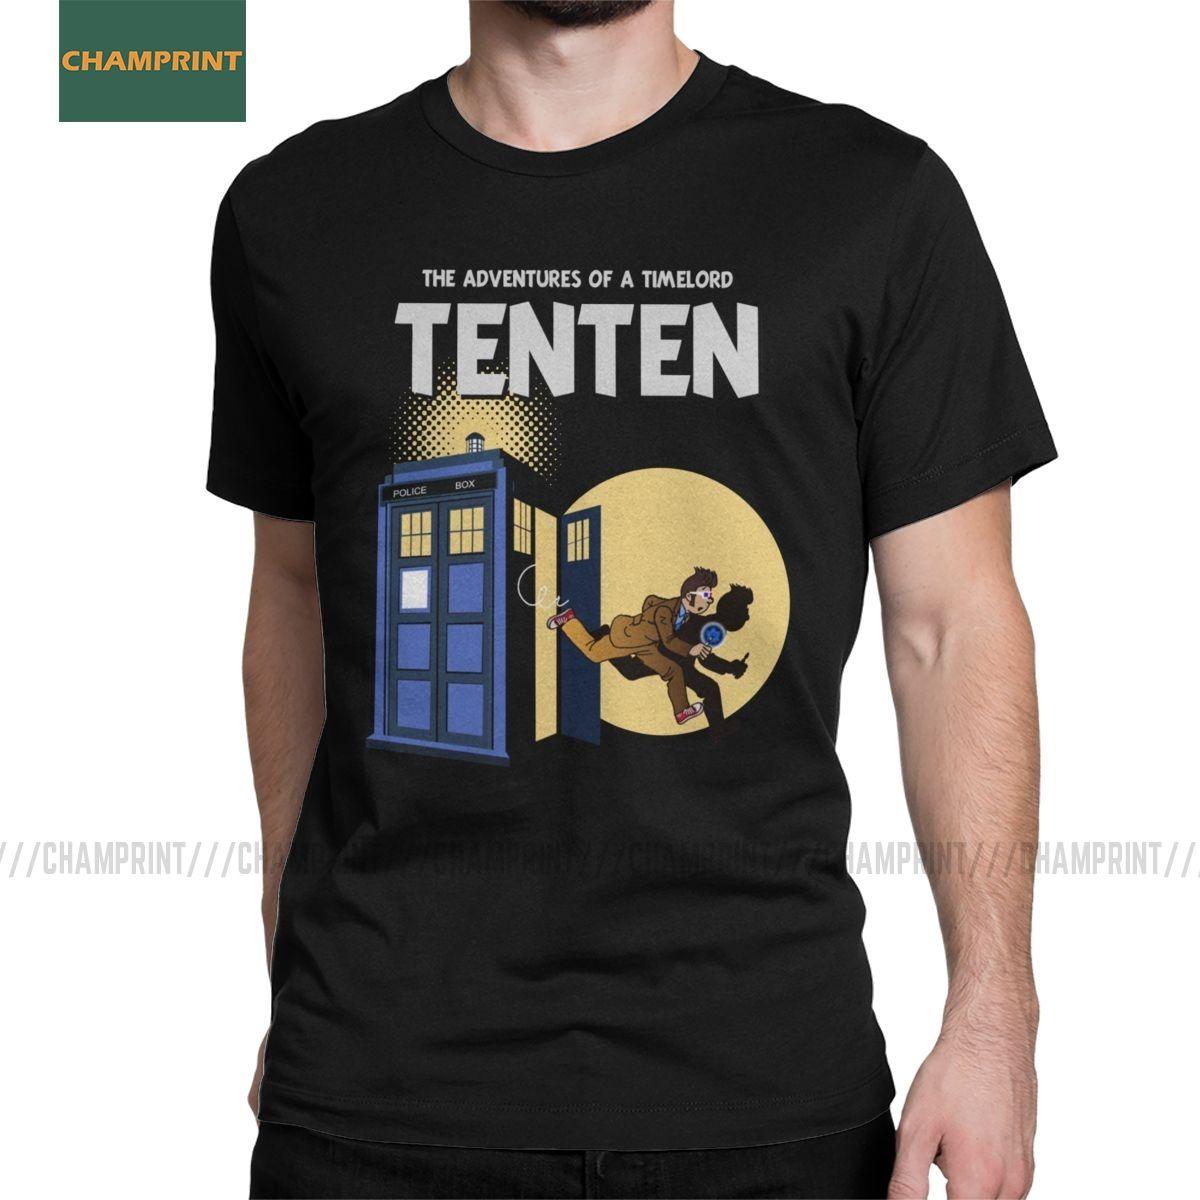 Tenten Doctor Who T-shirt Homens Tardis lobo mau Dalek Gallifrey Timelord Blue Box Cotton Tees camiseta manga curta tamanho grande Tops